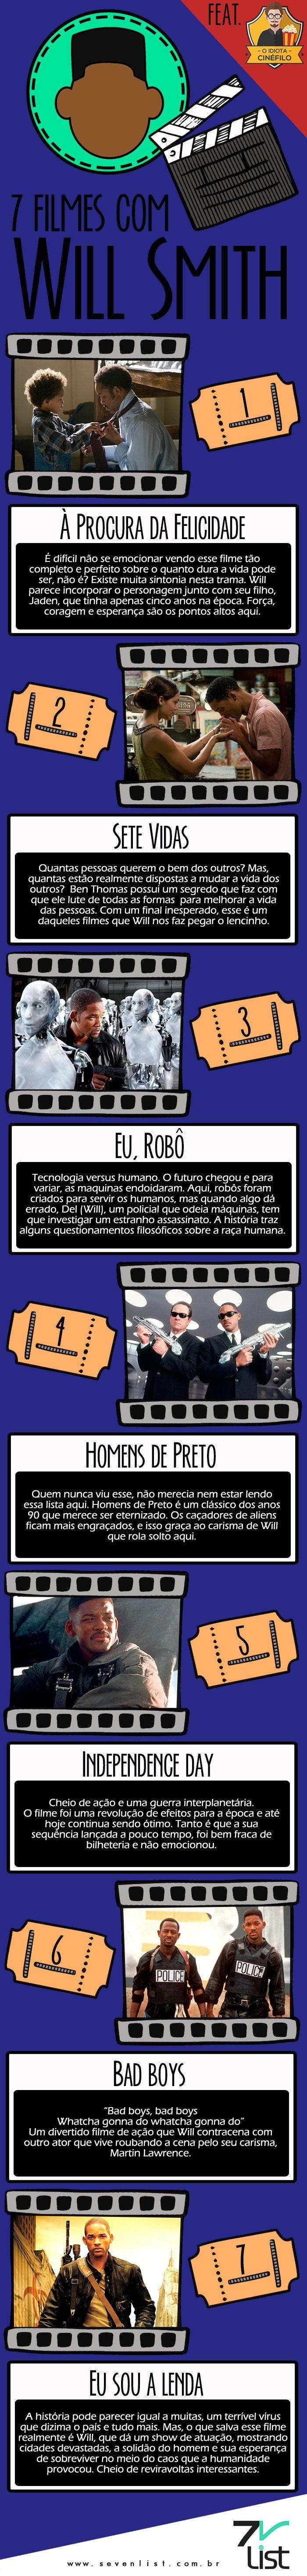 #SevenList #Infográfico #Art #Design #Entretenimento #Movie #Cinema #Filme #Cine #WillSmith